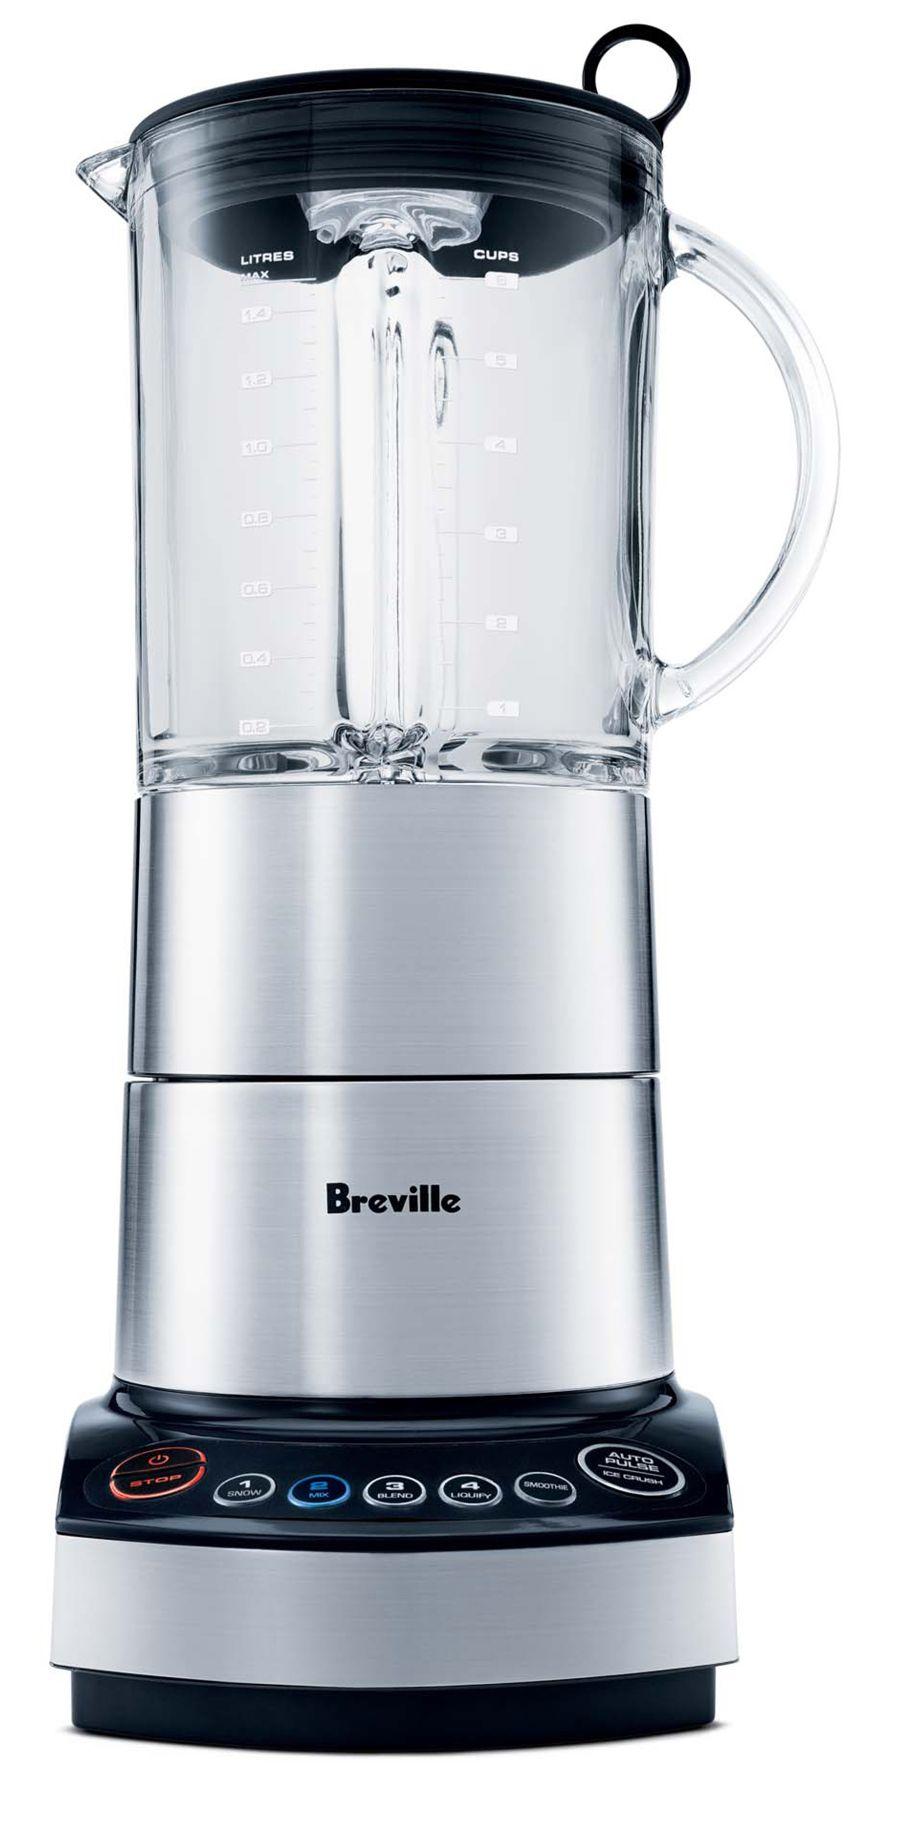 Breville blender now youre cookin pinterest